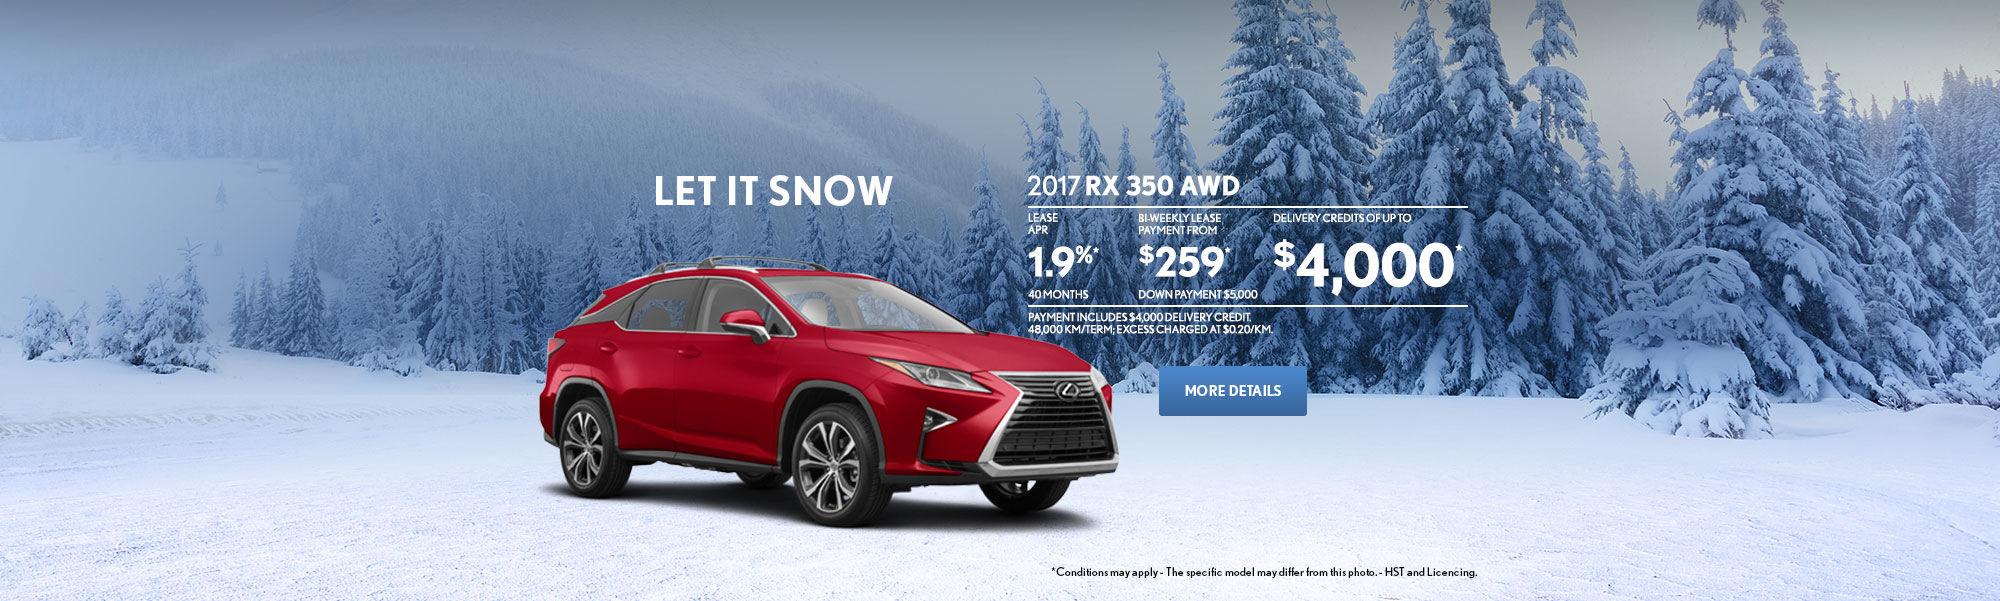 Let it snow - RX